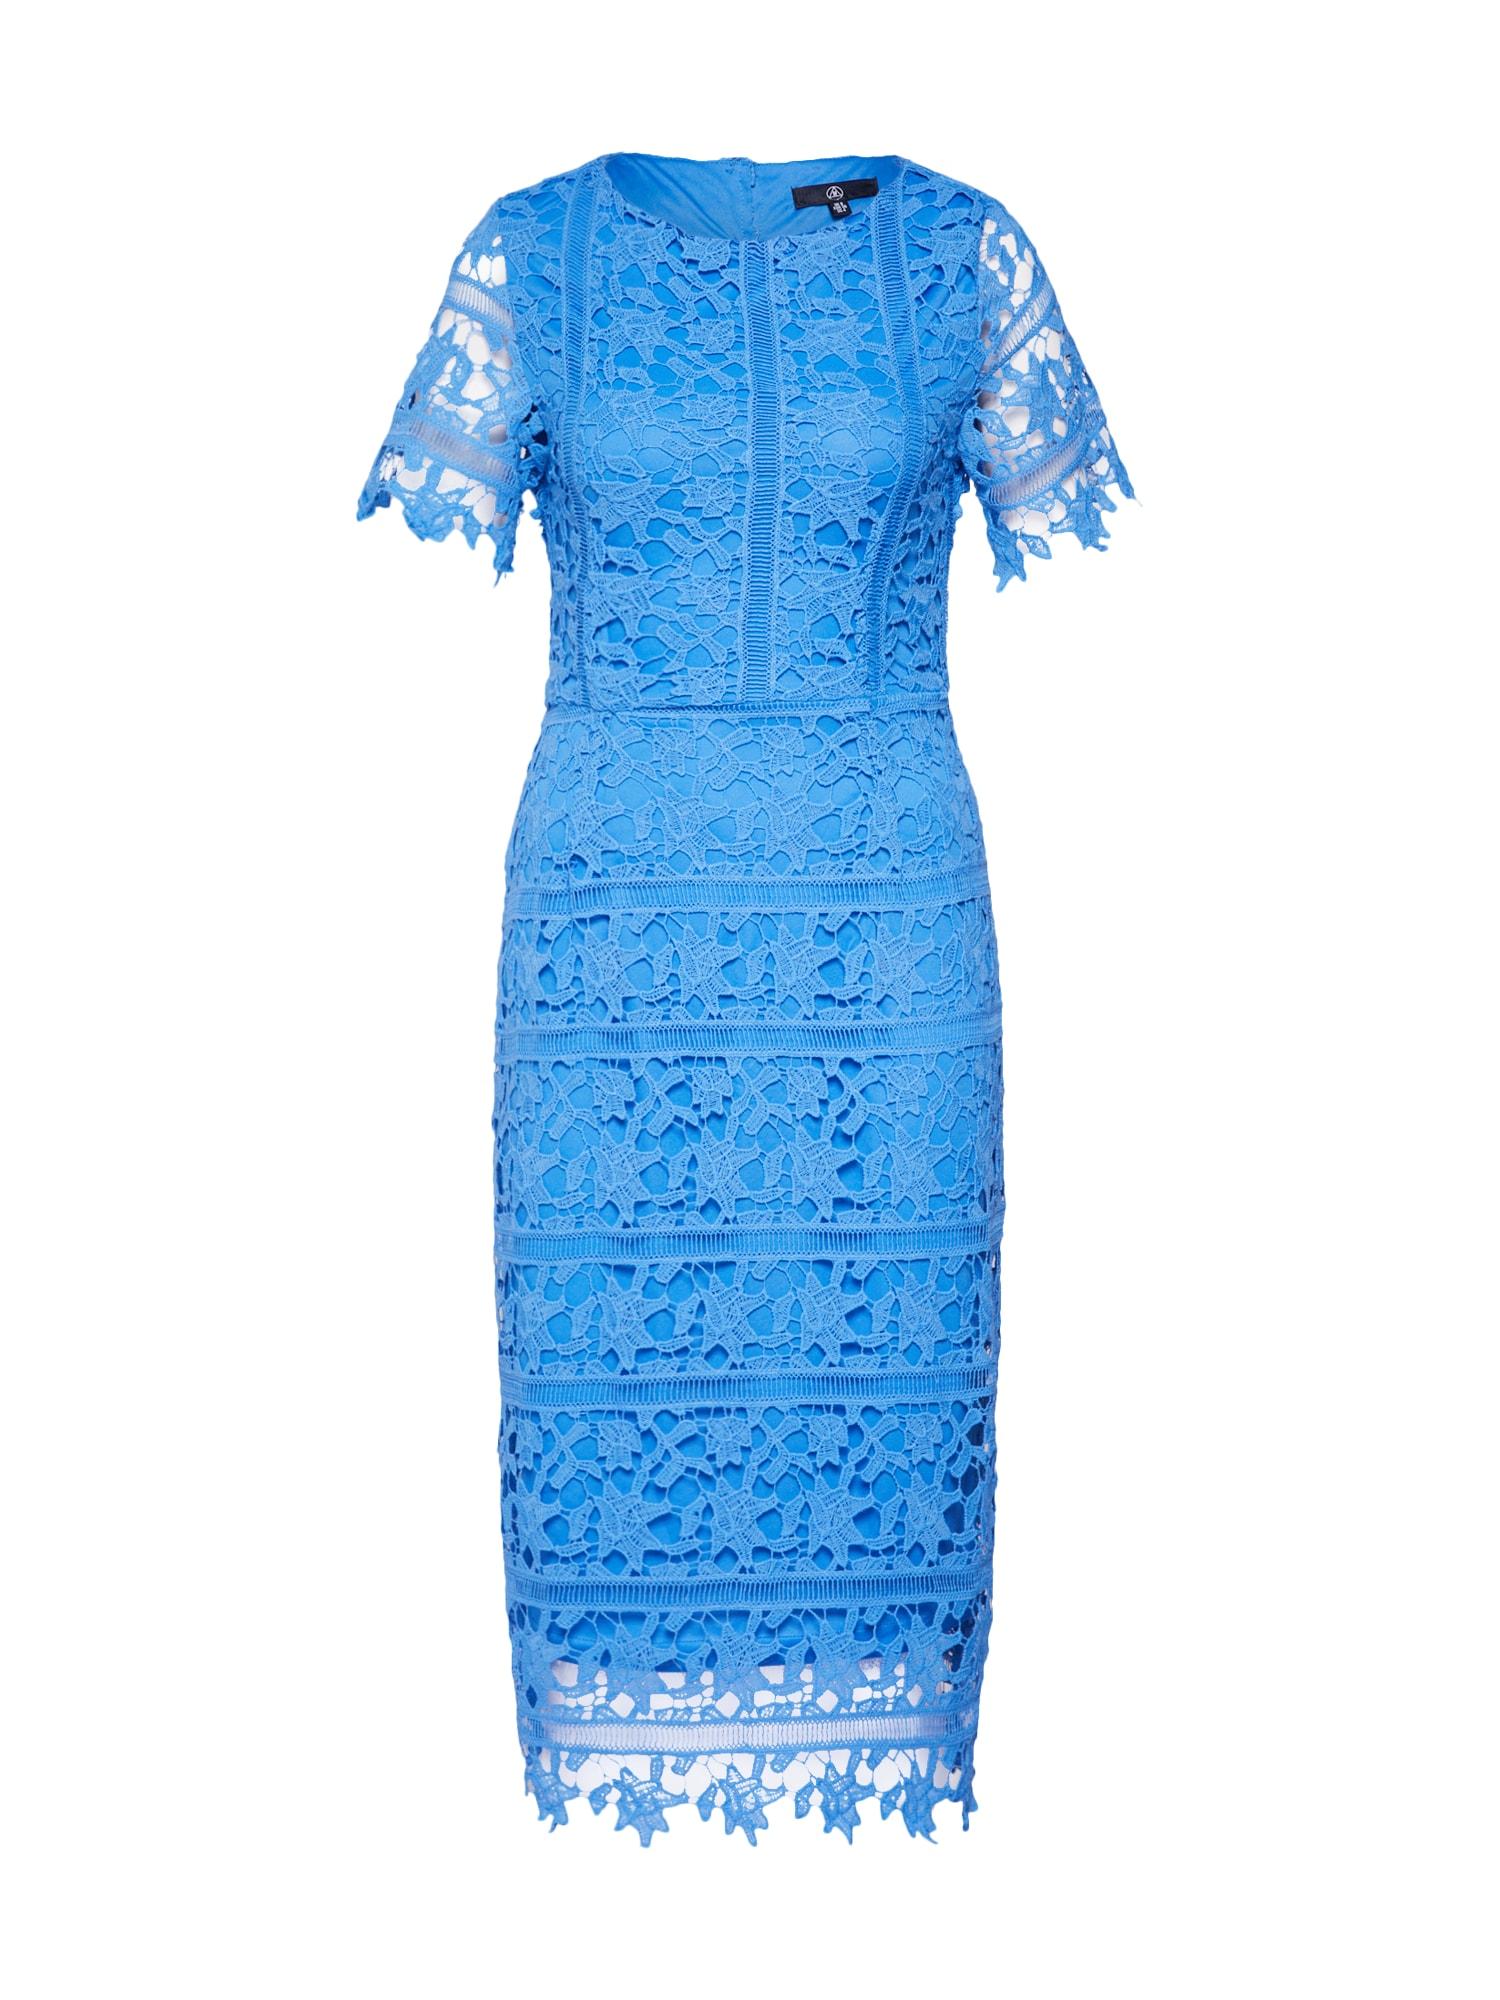 Koktejlové šaty Crochet Open Back modrá Missguided